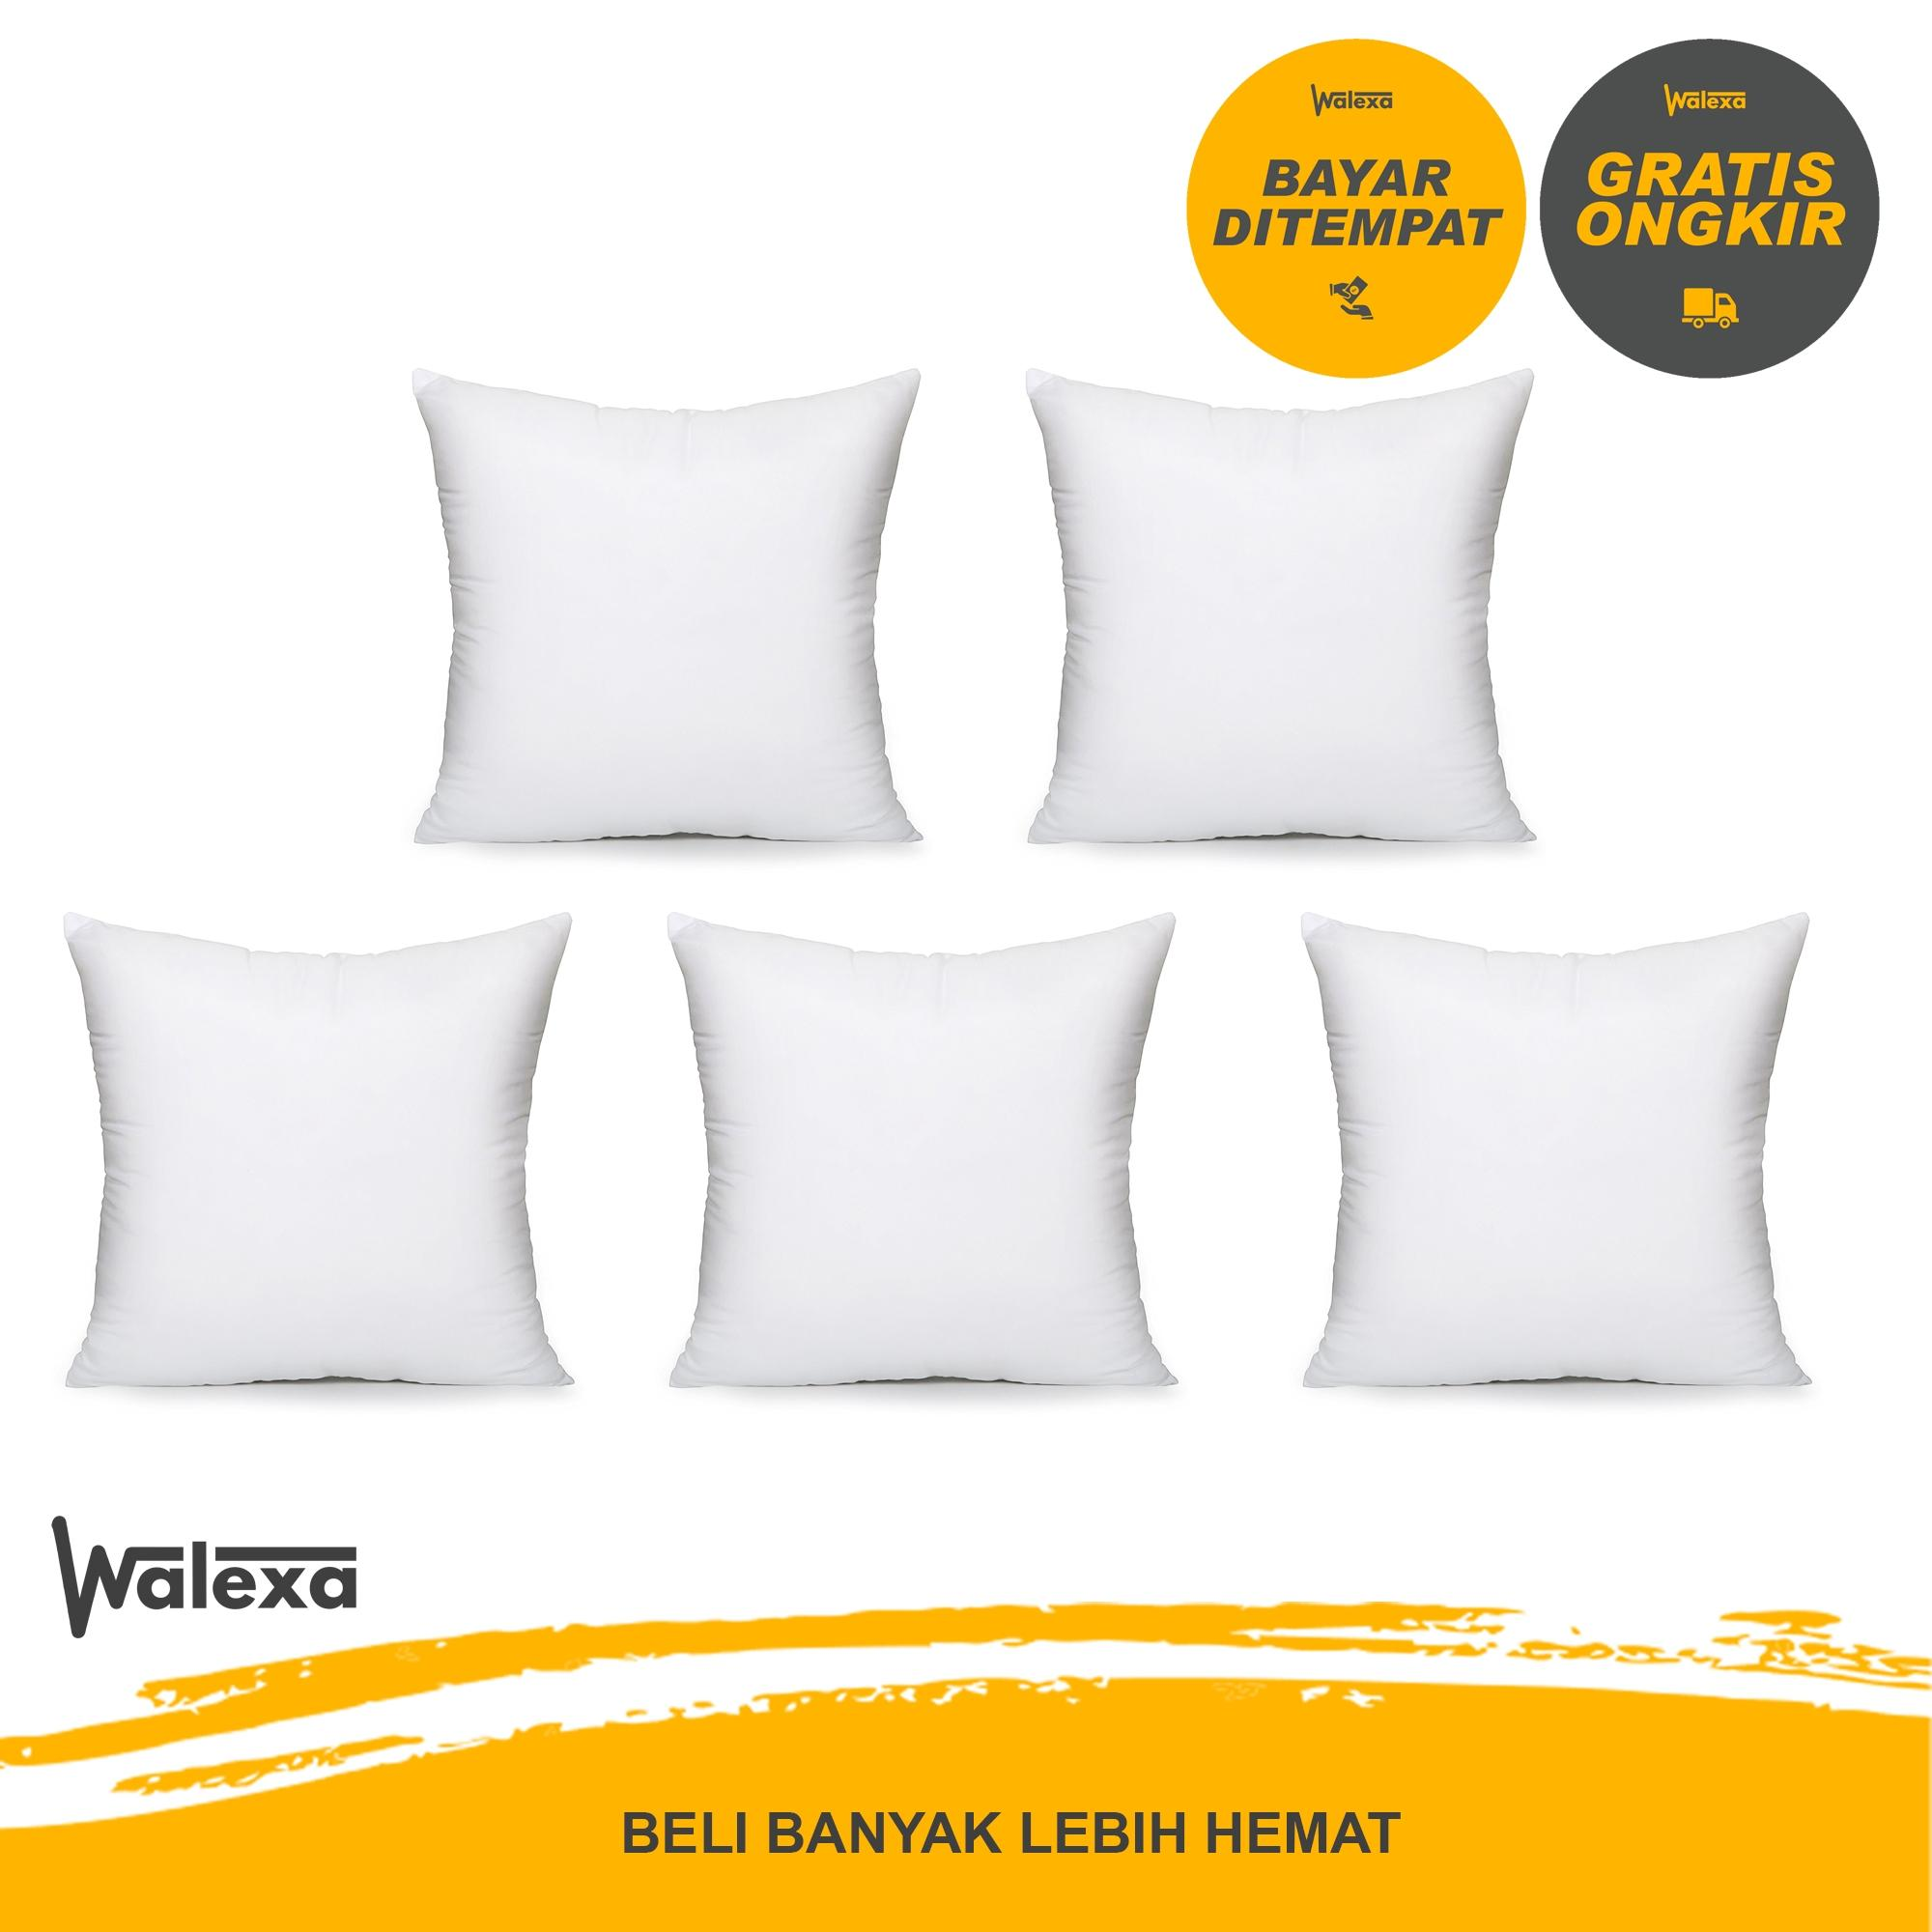 Paket 5 Pcs Promo Bantal Sofa Tamu 40 x 40 cm - Kursi - Bantal Standar Hotel  (Hanya Bantal)